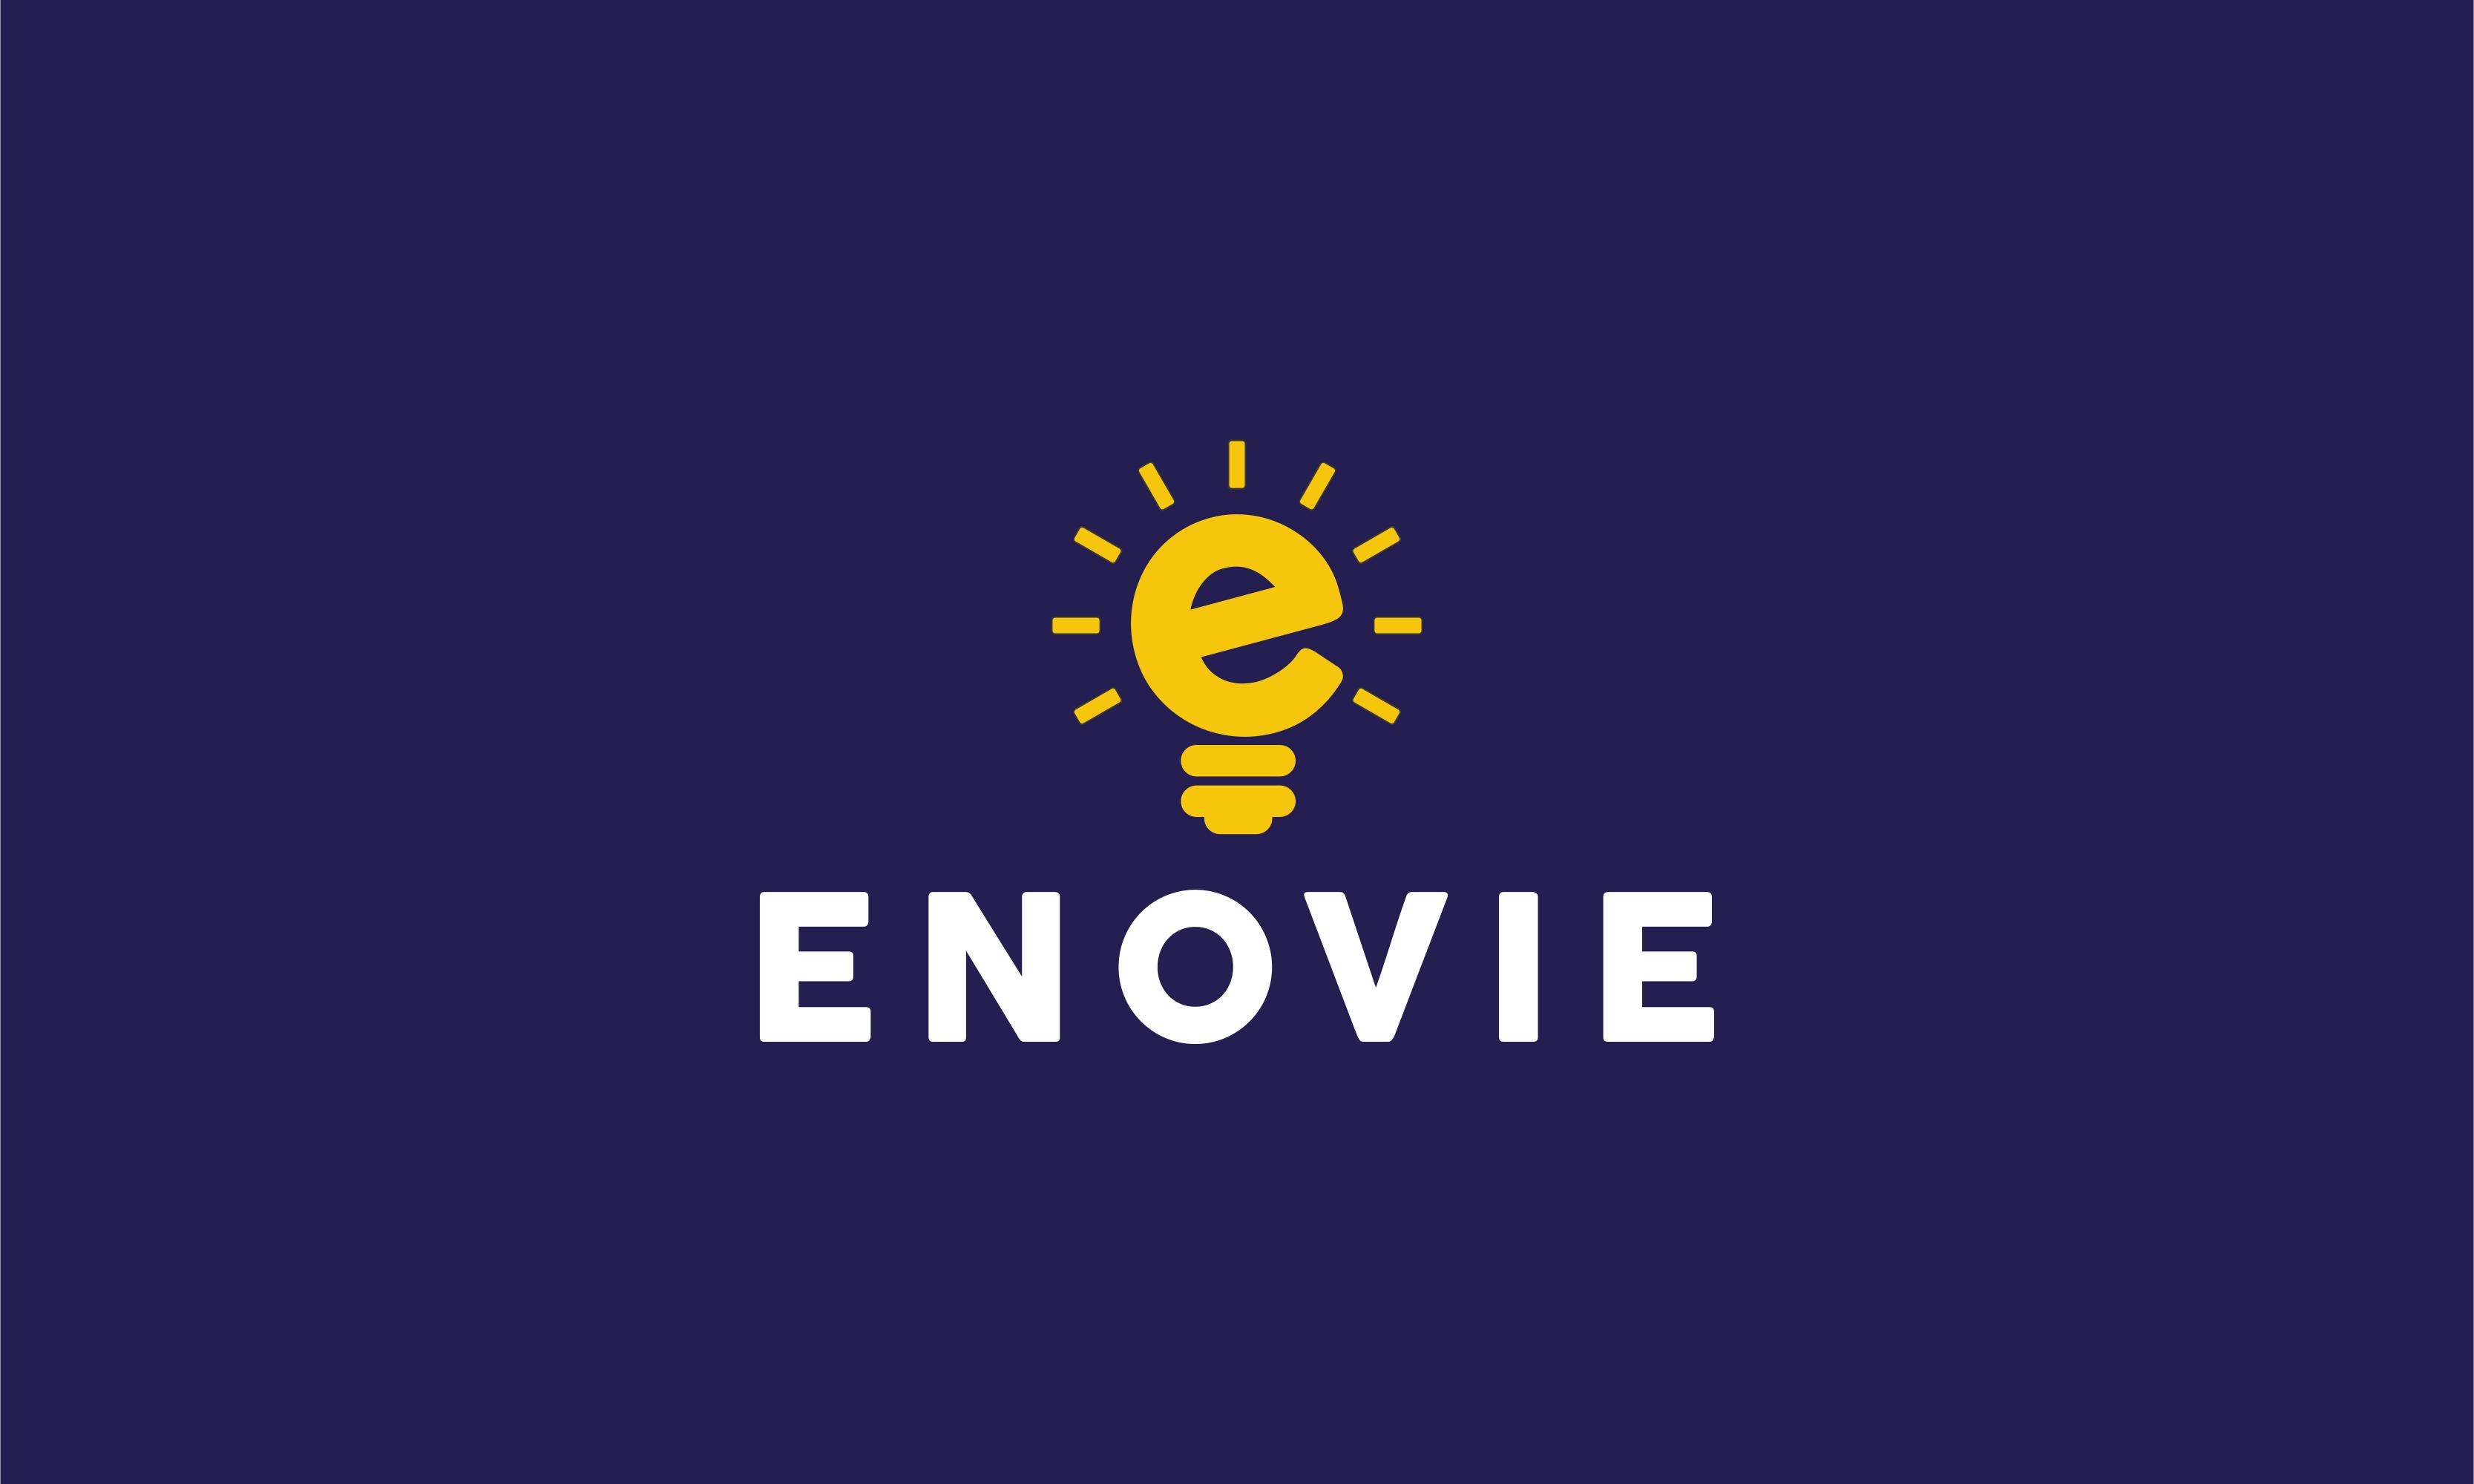 Enovie